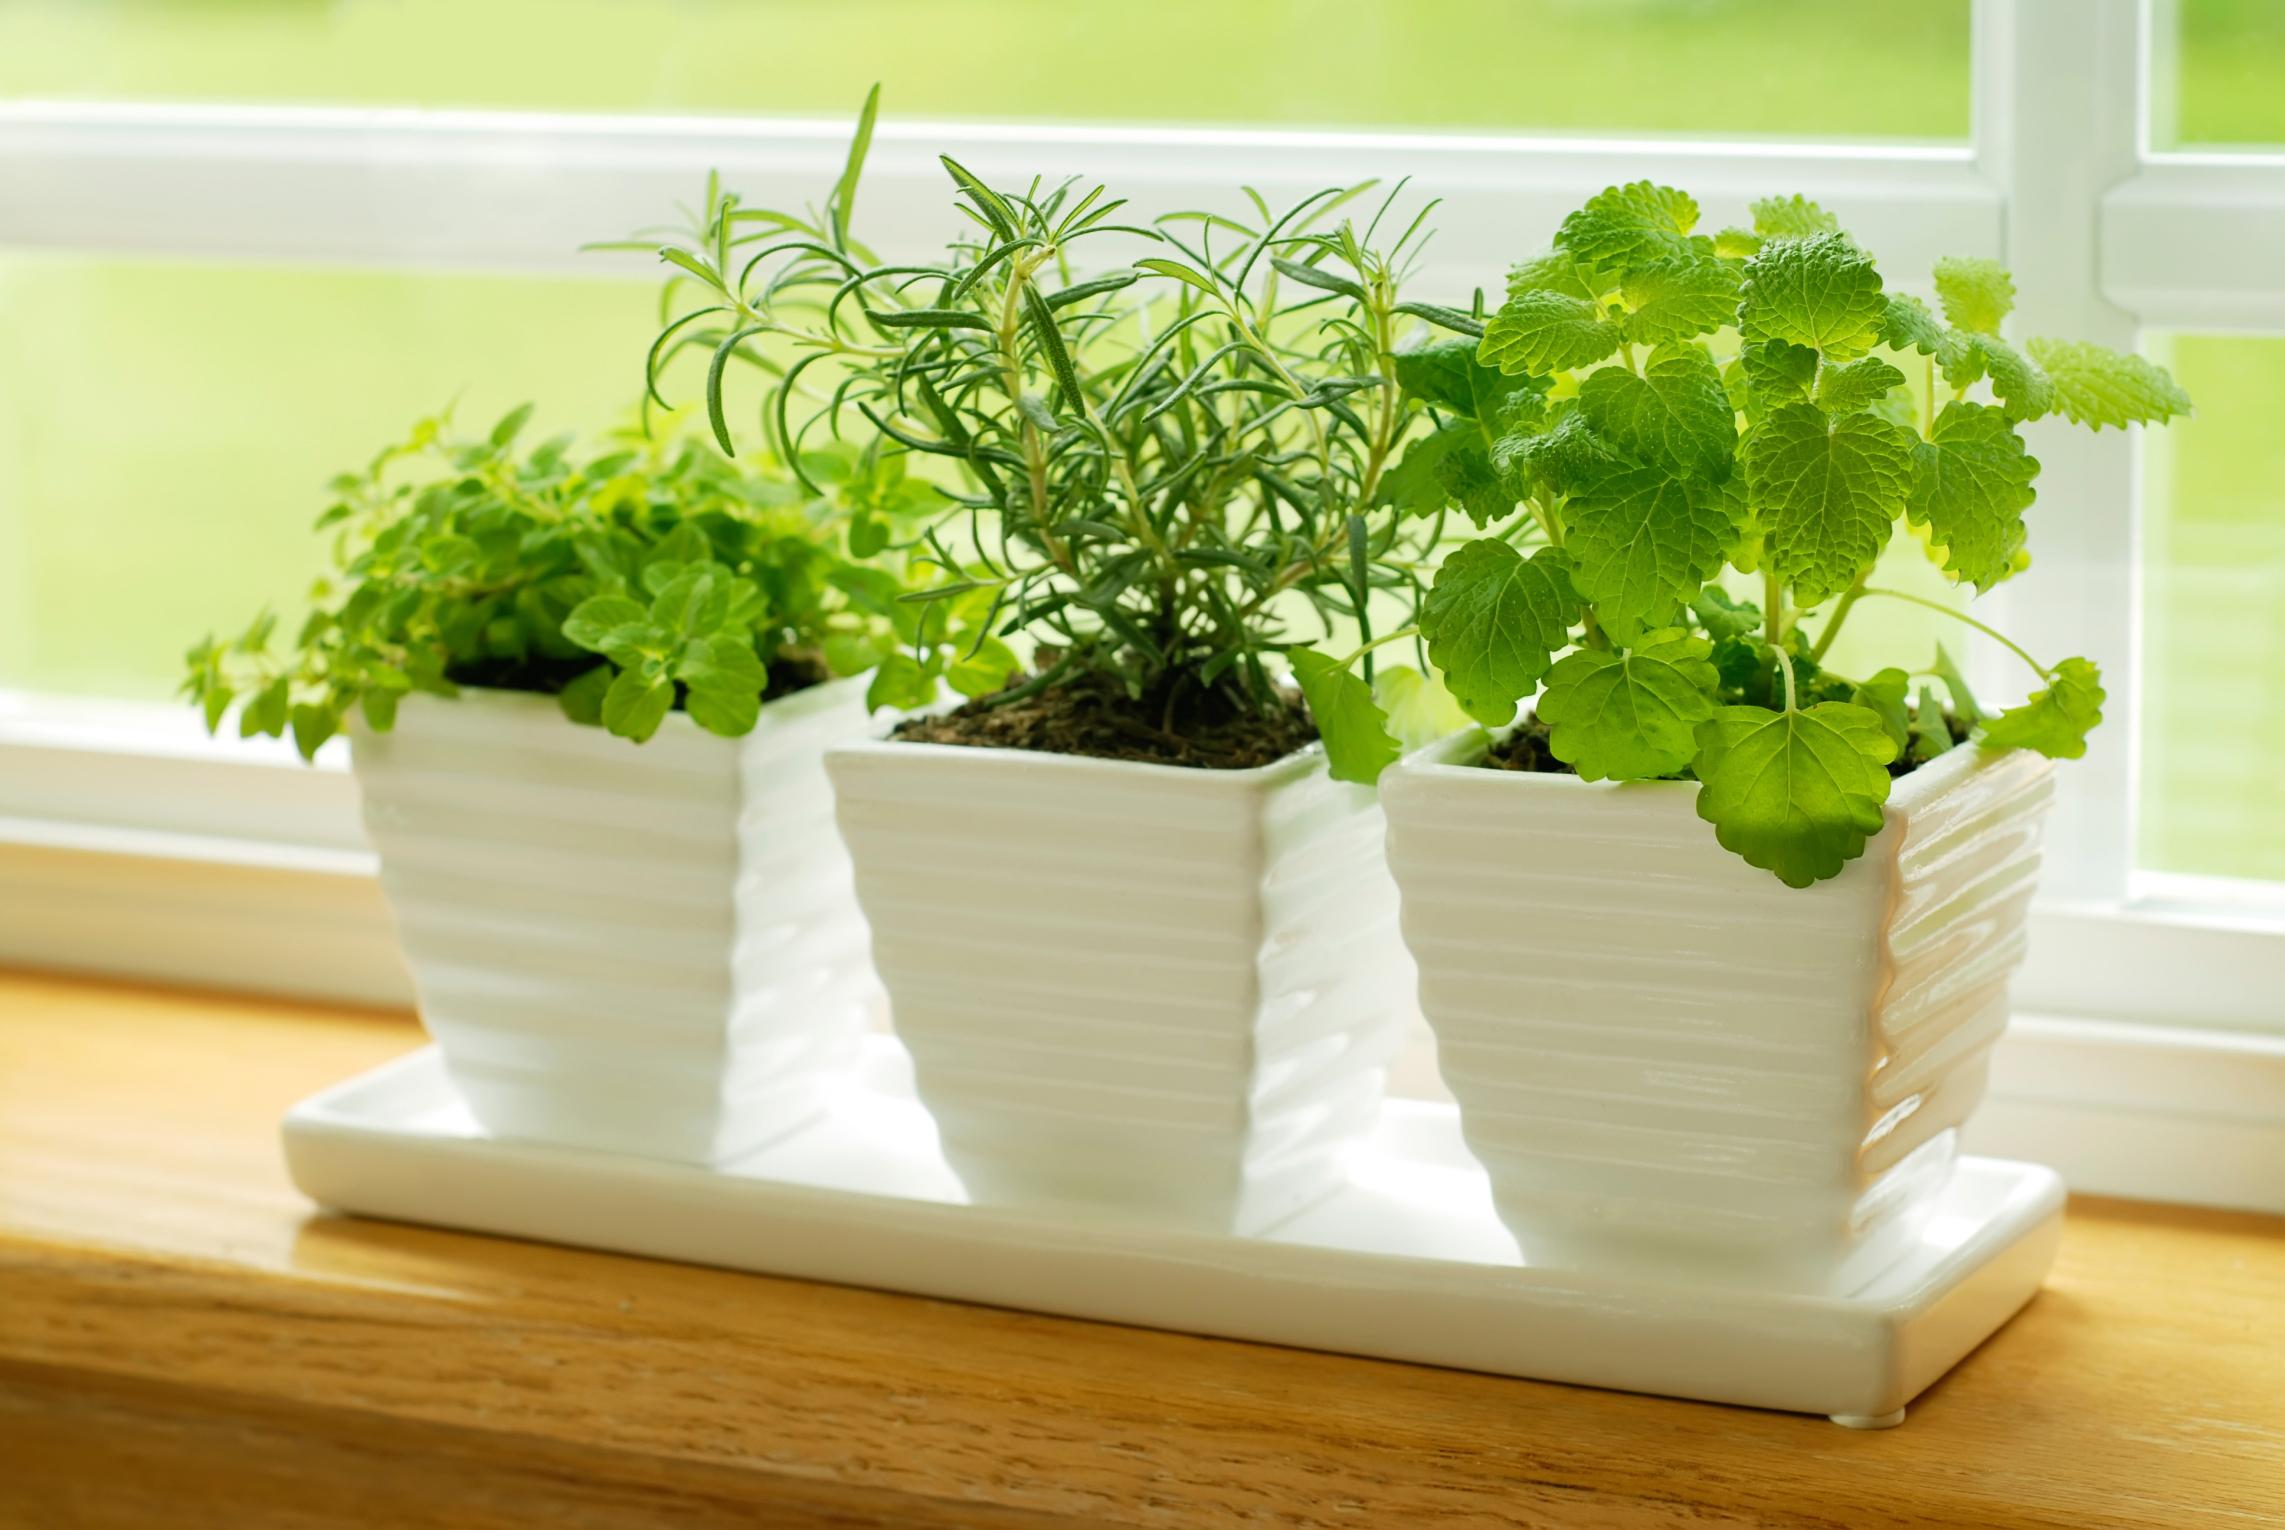 Erbe aromatiche da cucina, come conserlarle fresche più a ...